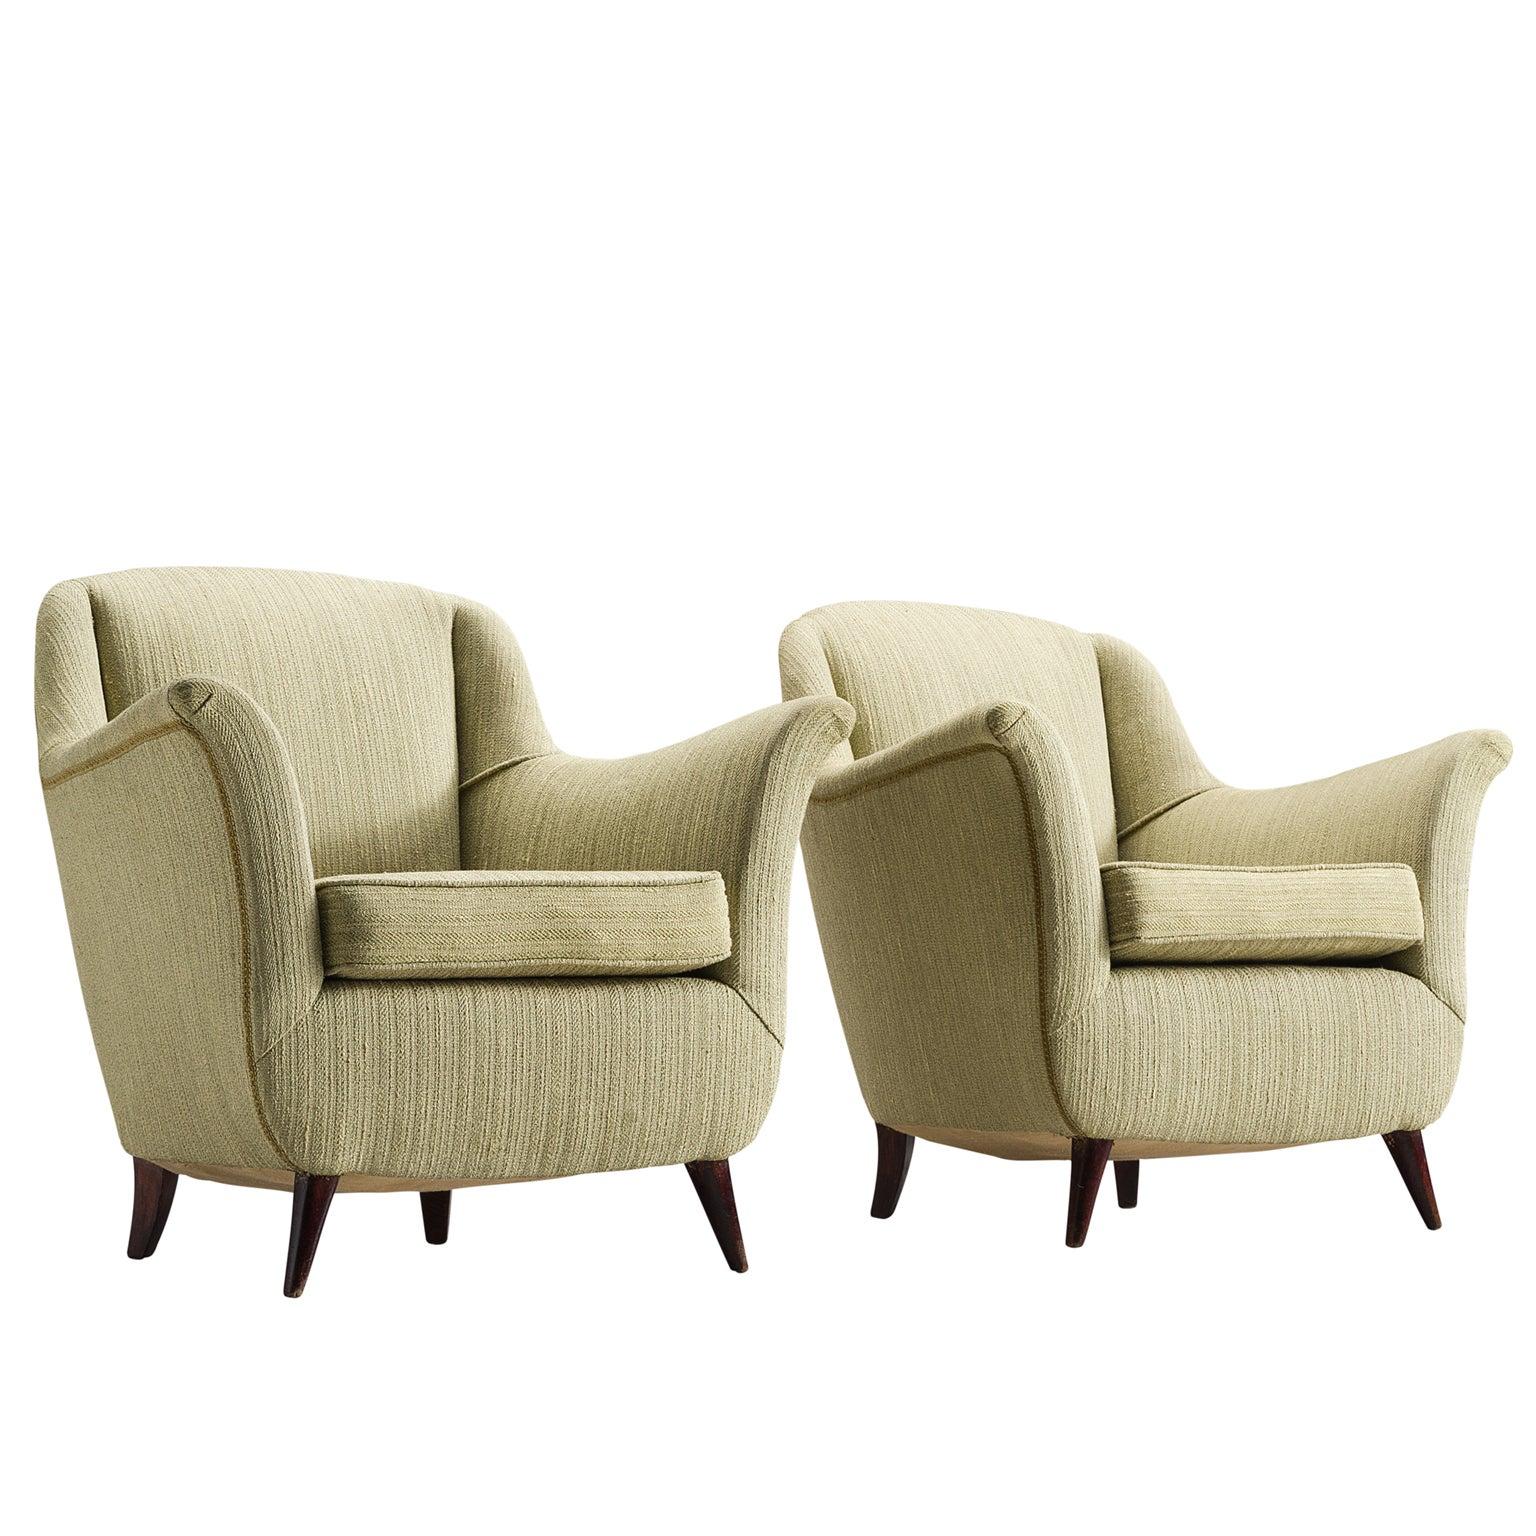 Italian Soft Green Lounge Chairs, 1950s